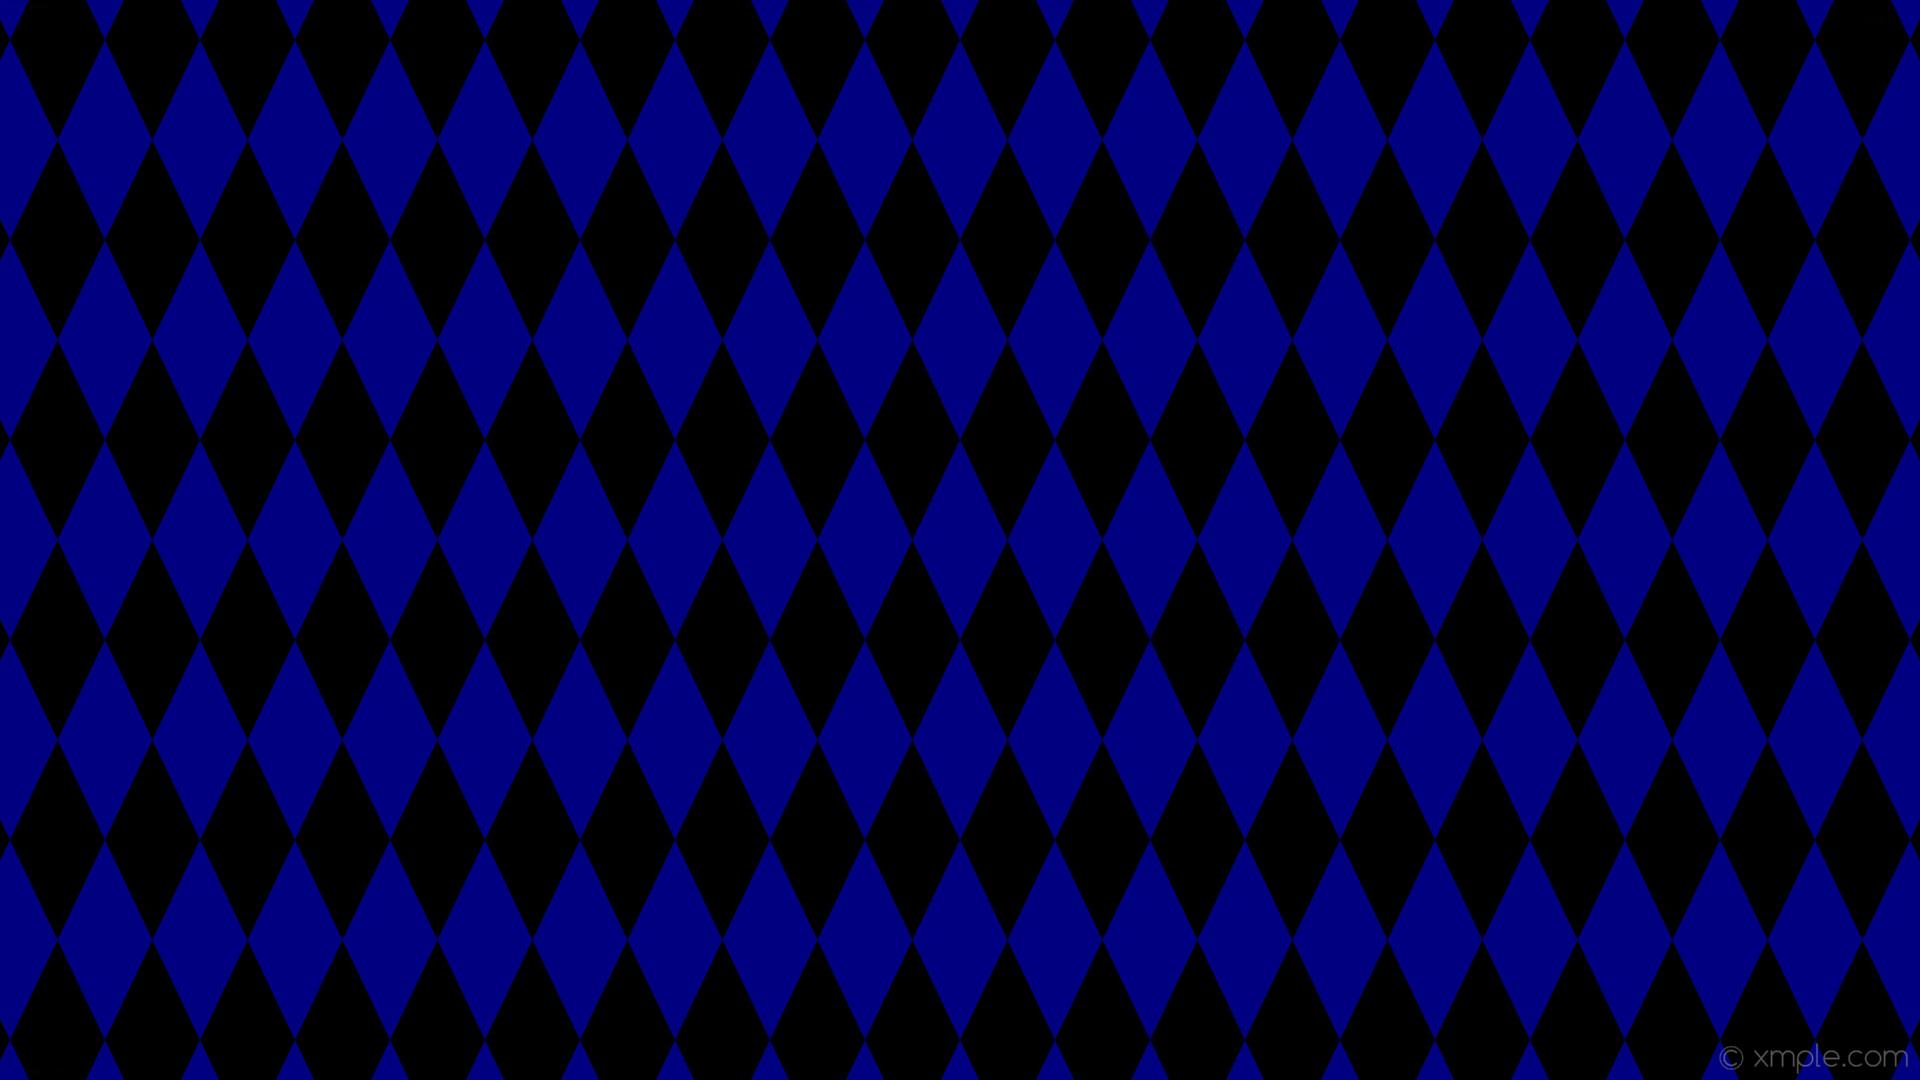 Res: 1920x1080, wallpaper rhombus blue lozenge black diamond navy #000080 #000000 90° 200px  95px